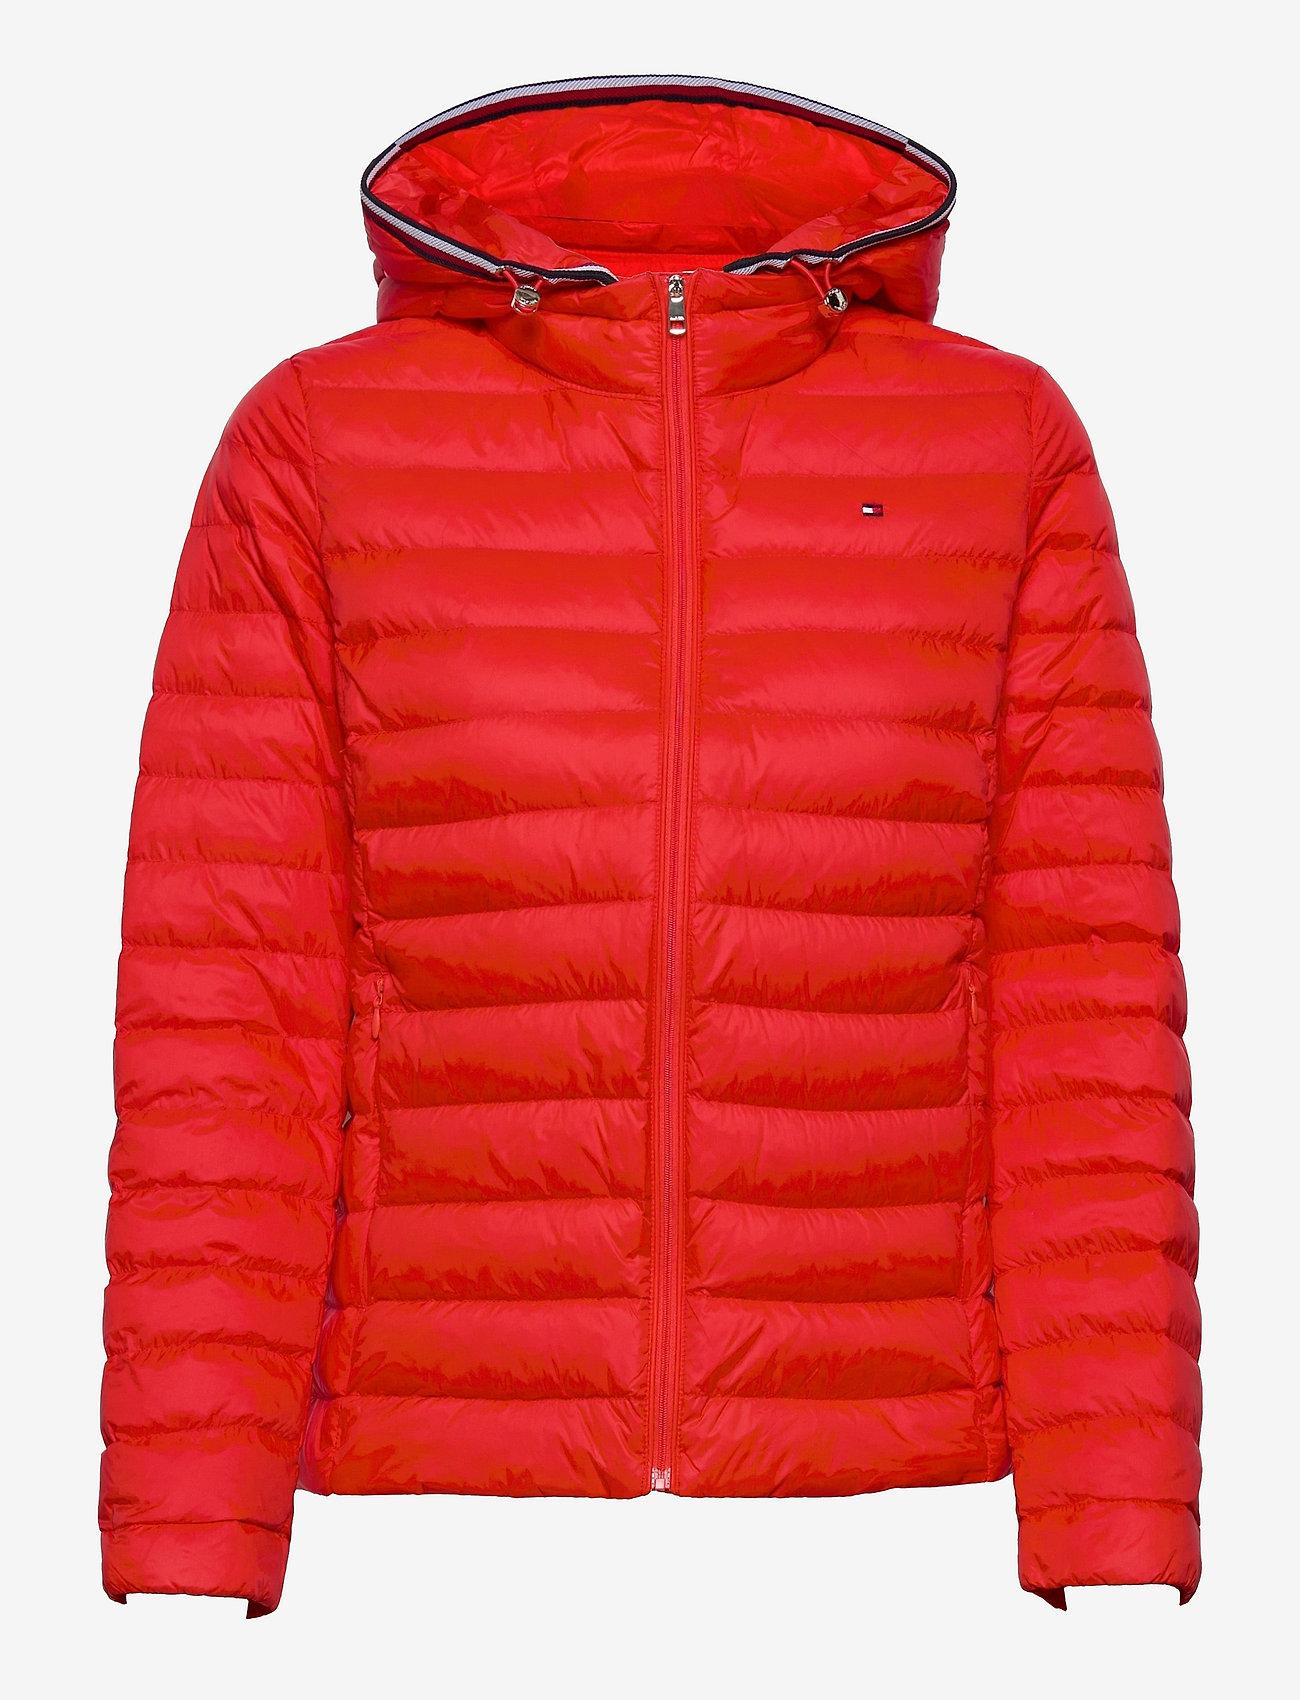 Tommy Hilfiger - TH ESS LW DOWN JKT - winter jackets - daring scarlet - 0